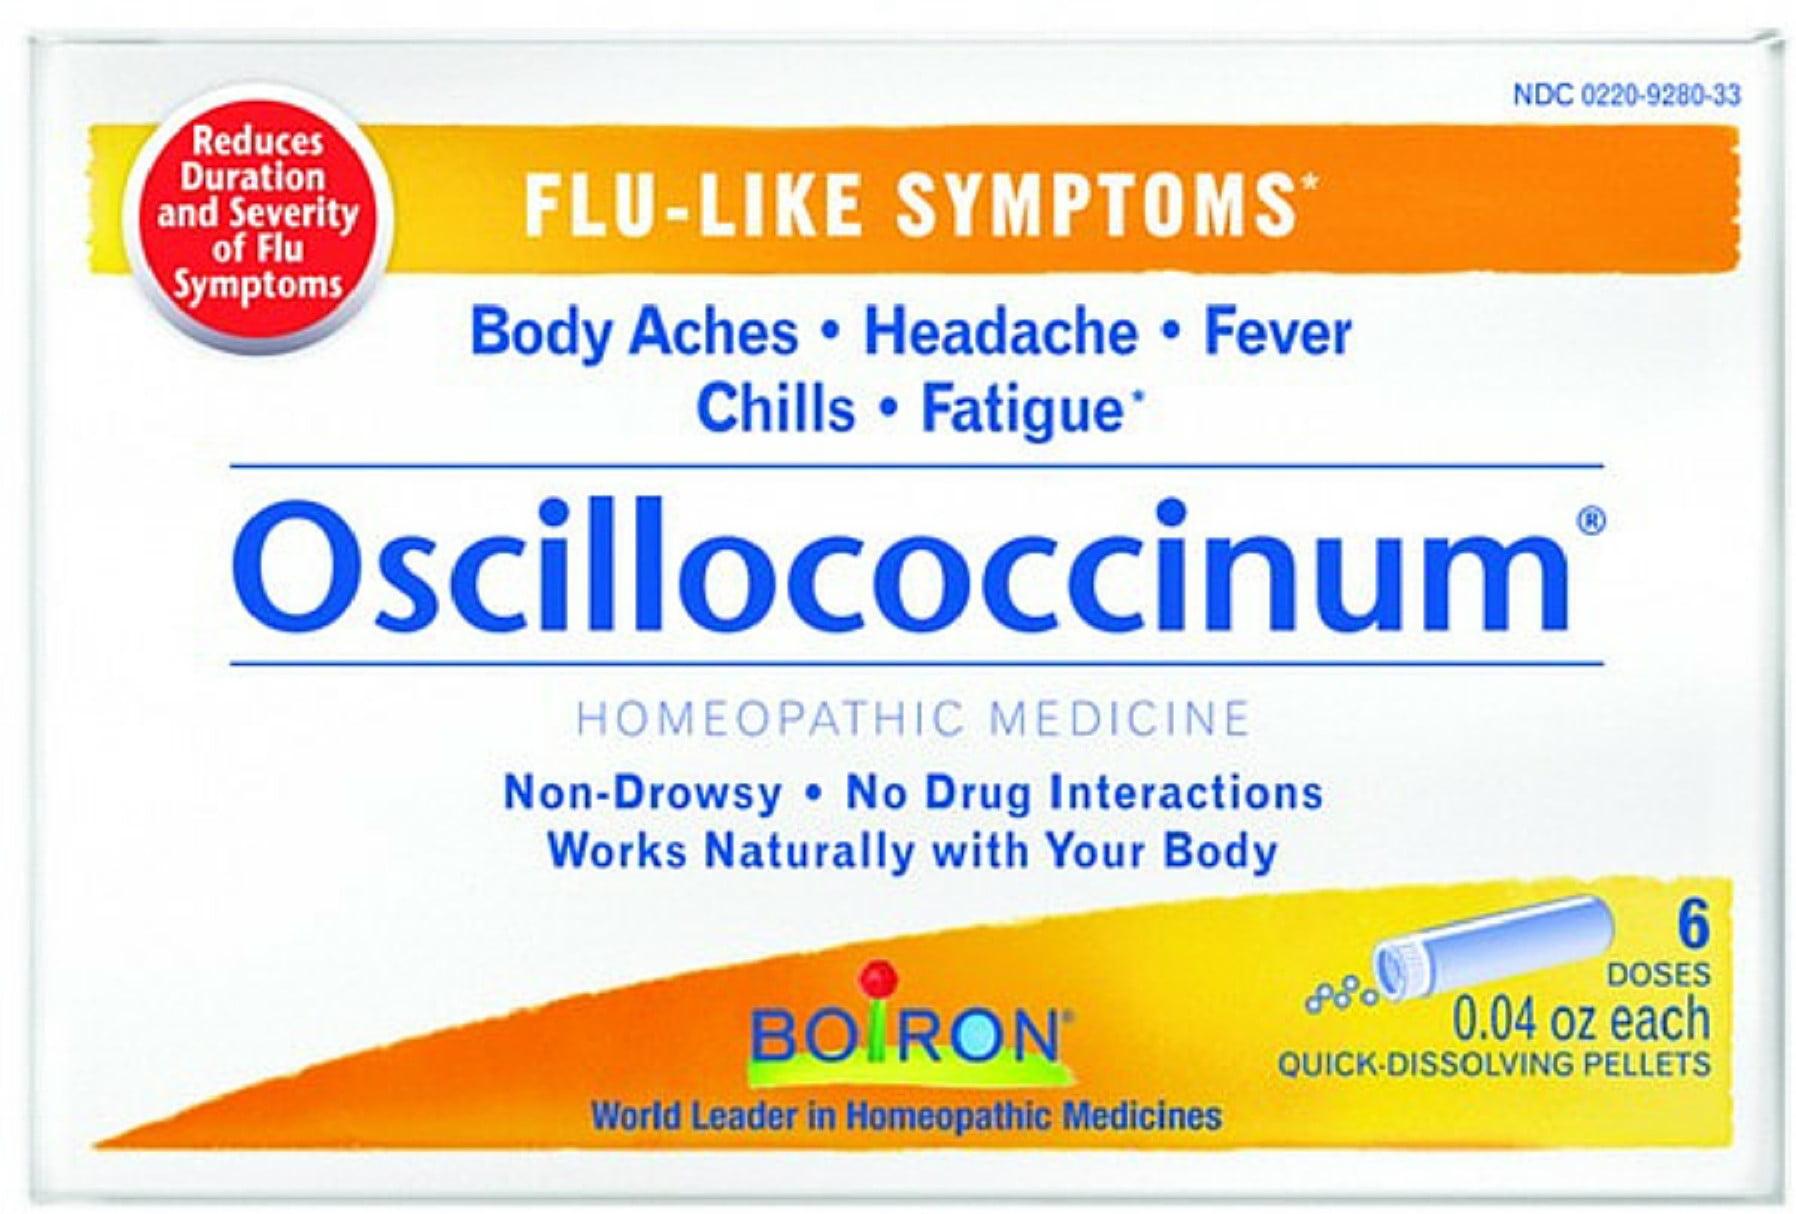 Oscillococcinum tamiflu and